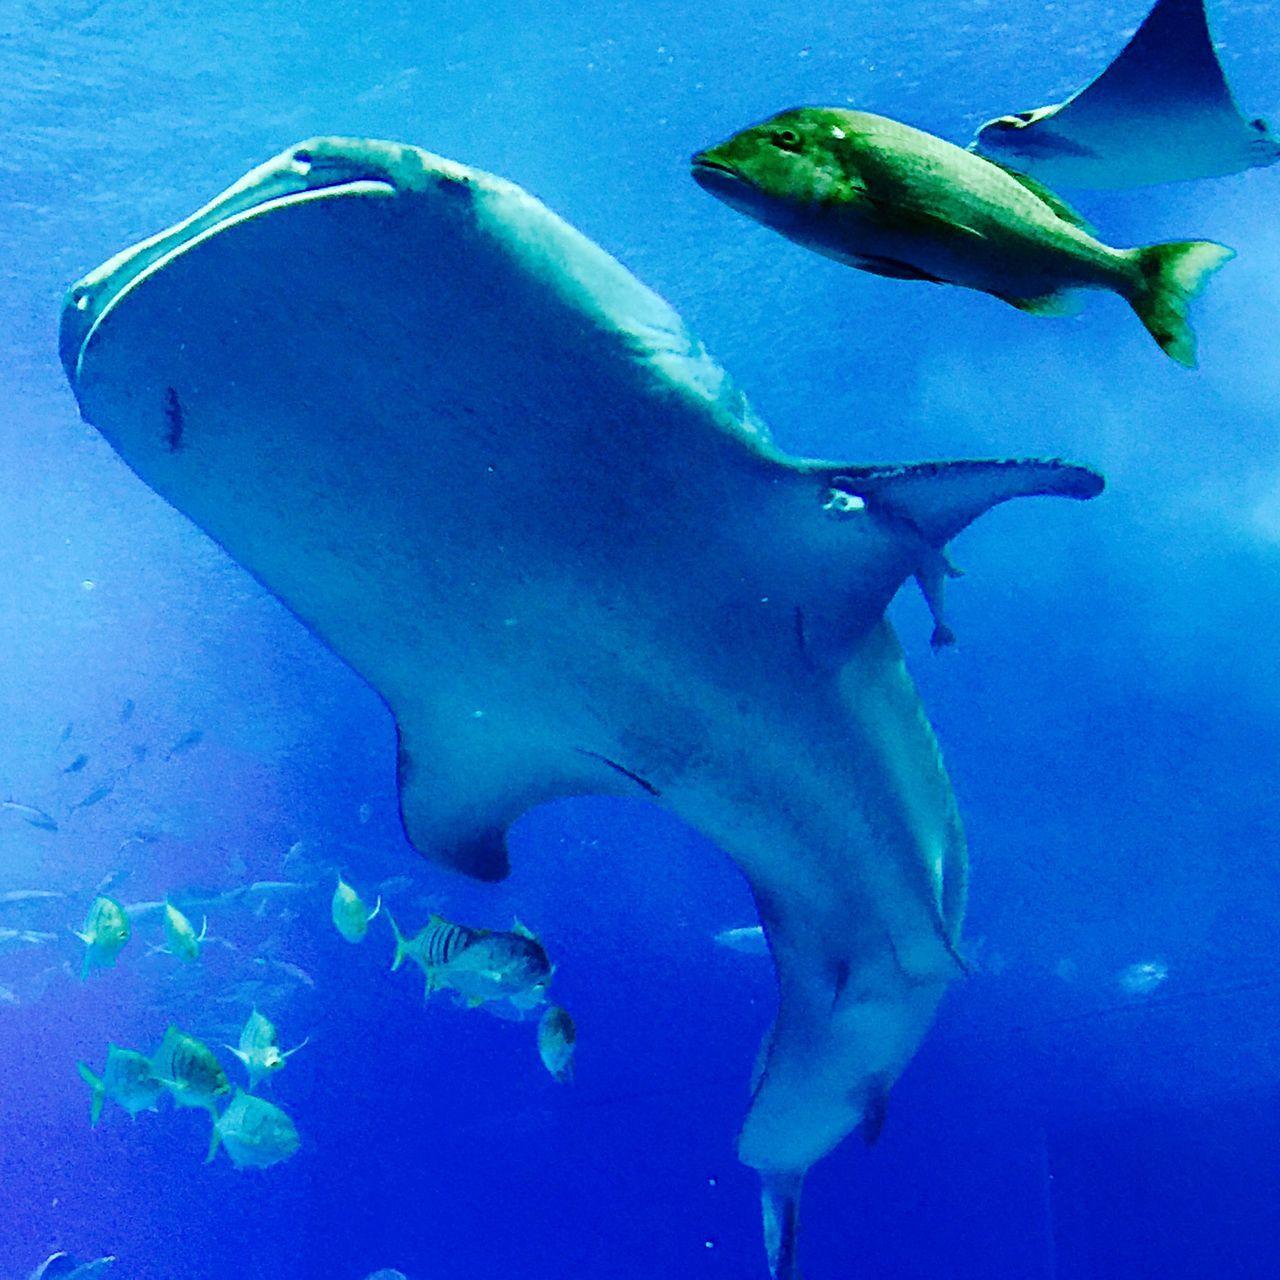 Okinawa churaumi aquarium Whale Shark Marlin Underwater Ocean Aquarium Okinawa Japan Blue Mantaray Fish